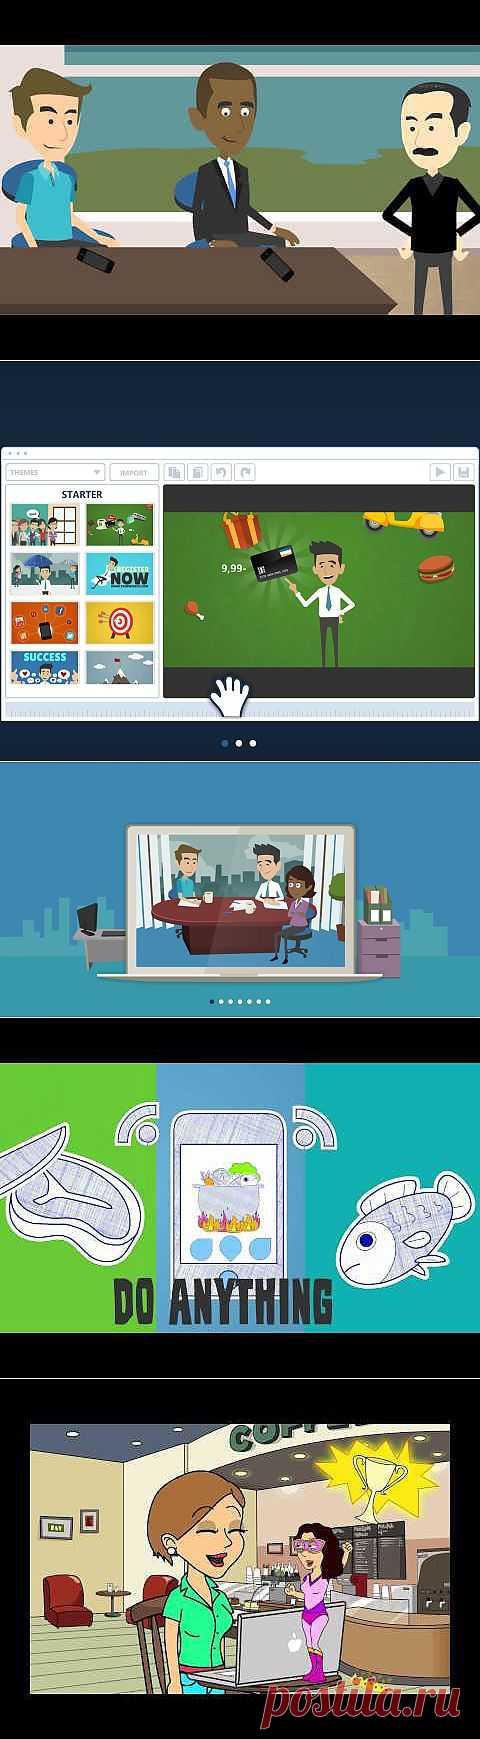 Make Business Video   Animated Video Production   GoAnimate.com Создание мультфильма